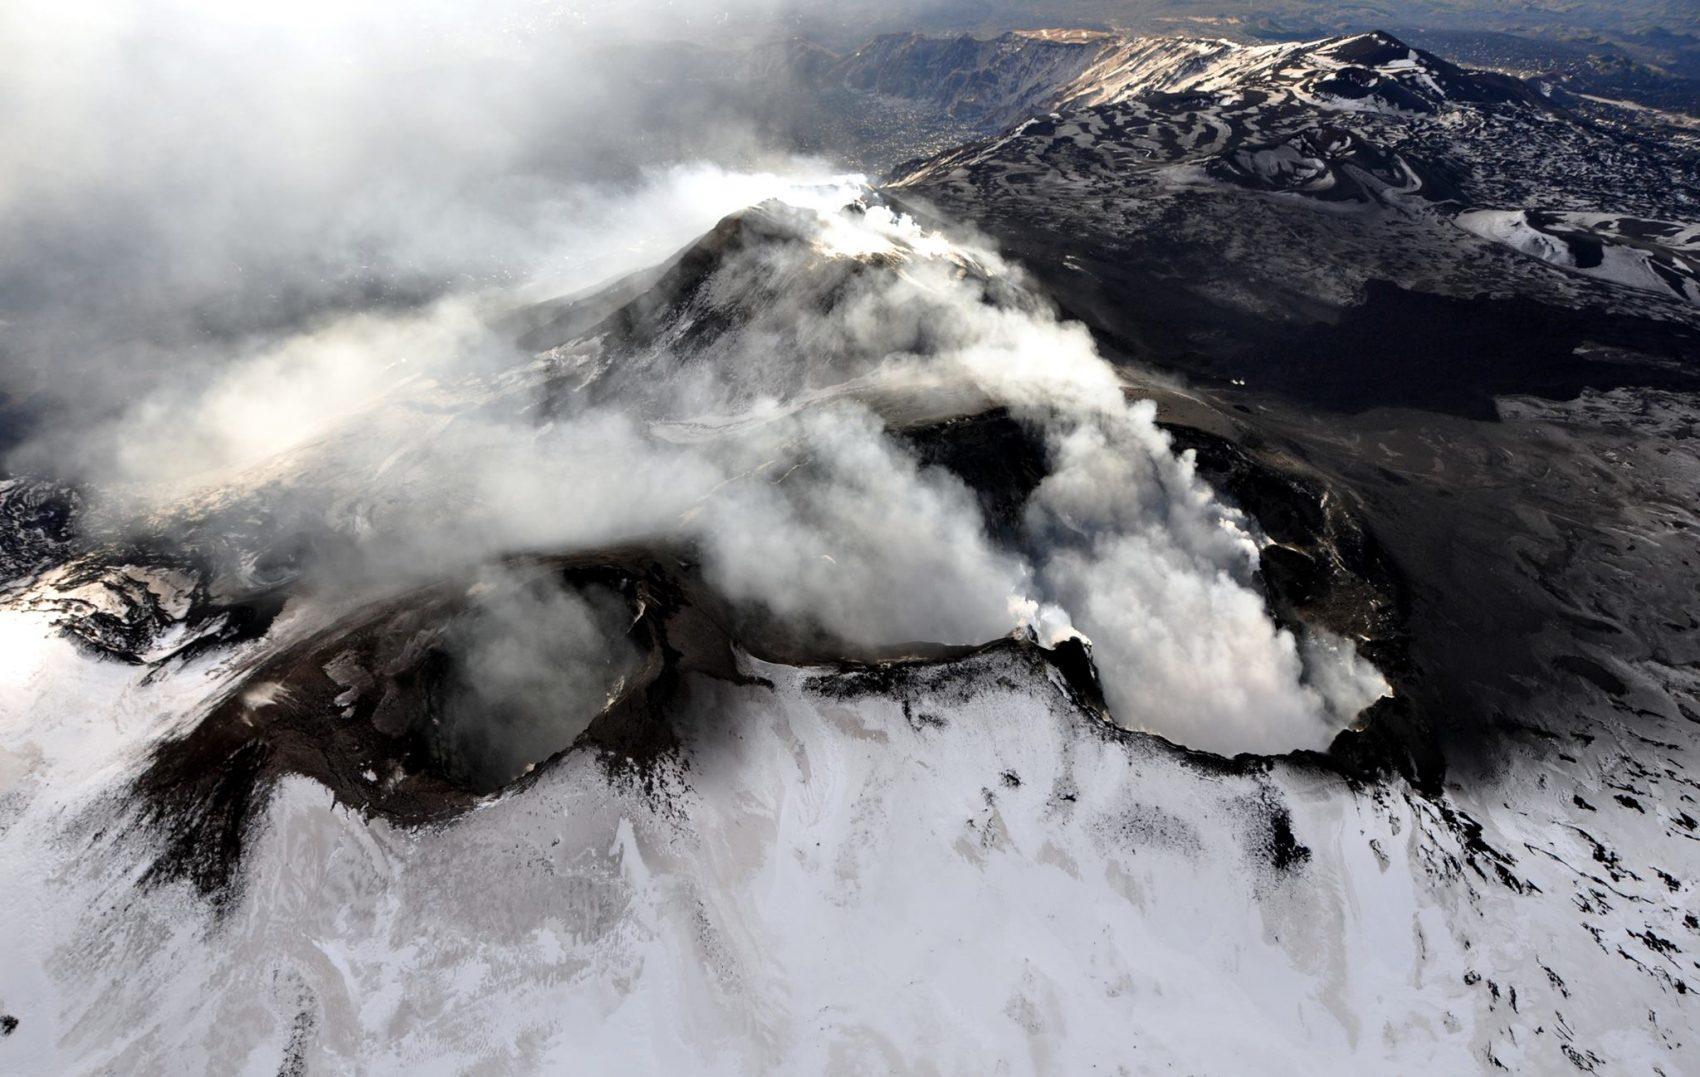 Mount volcano